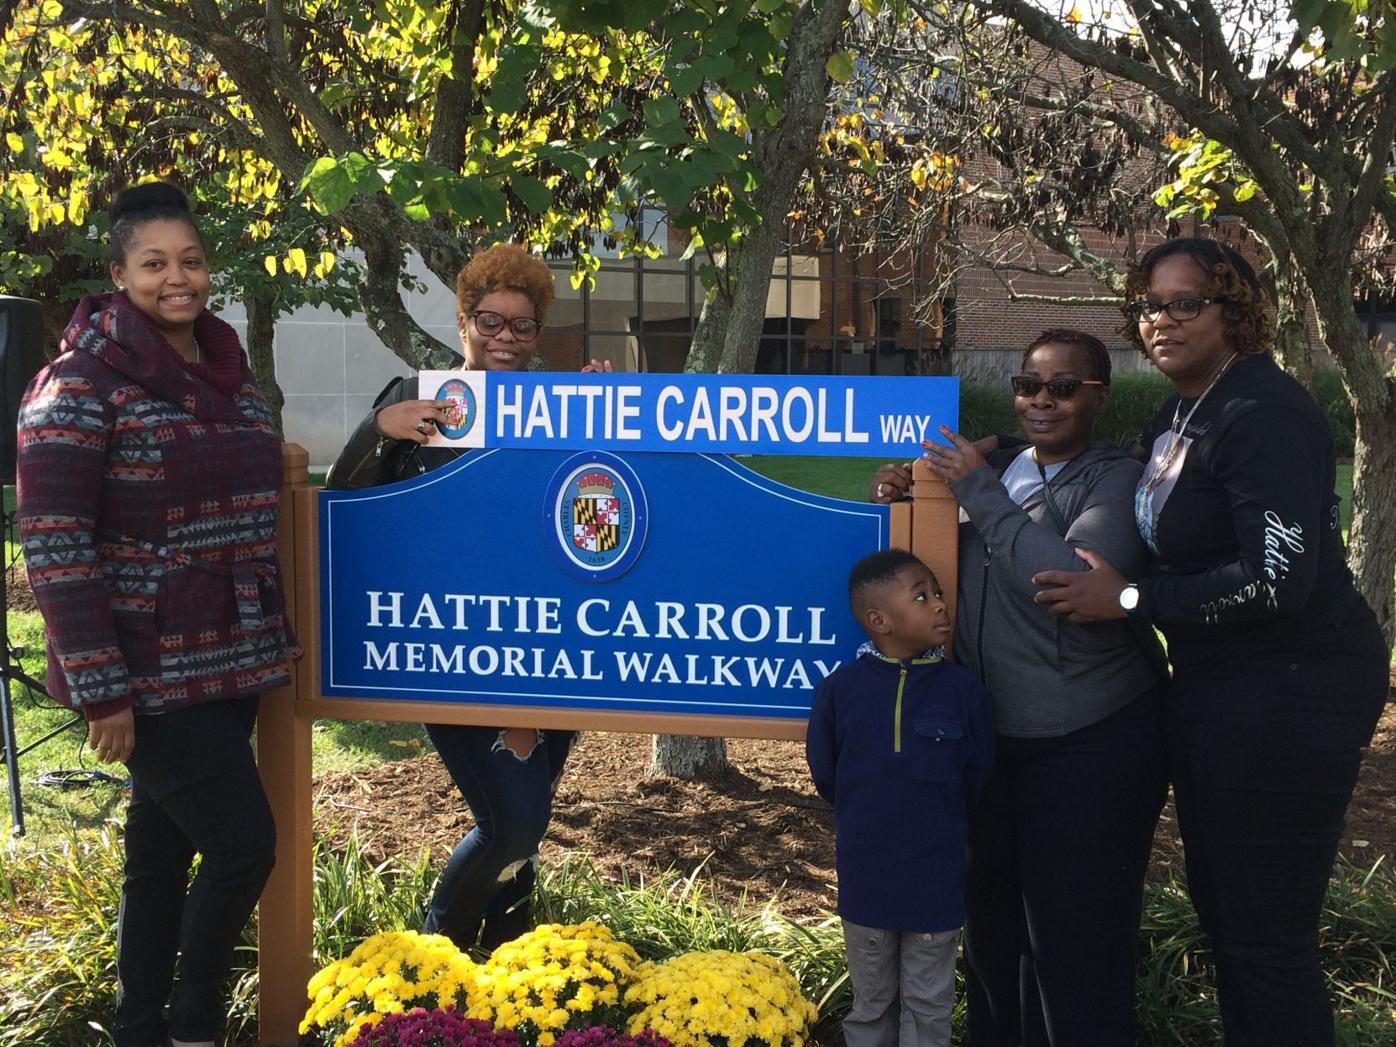 County Commissioners dedicate sidewalk to victim of hate crime